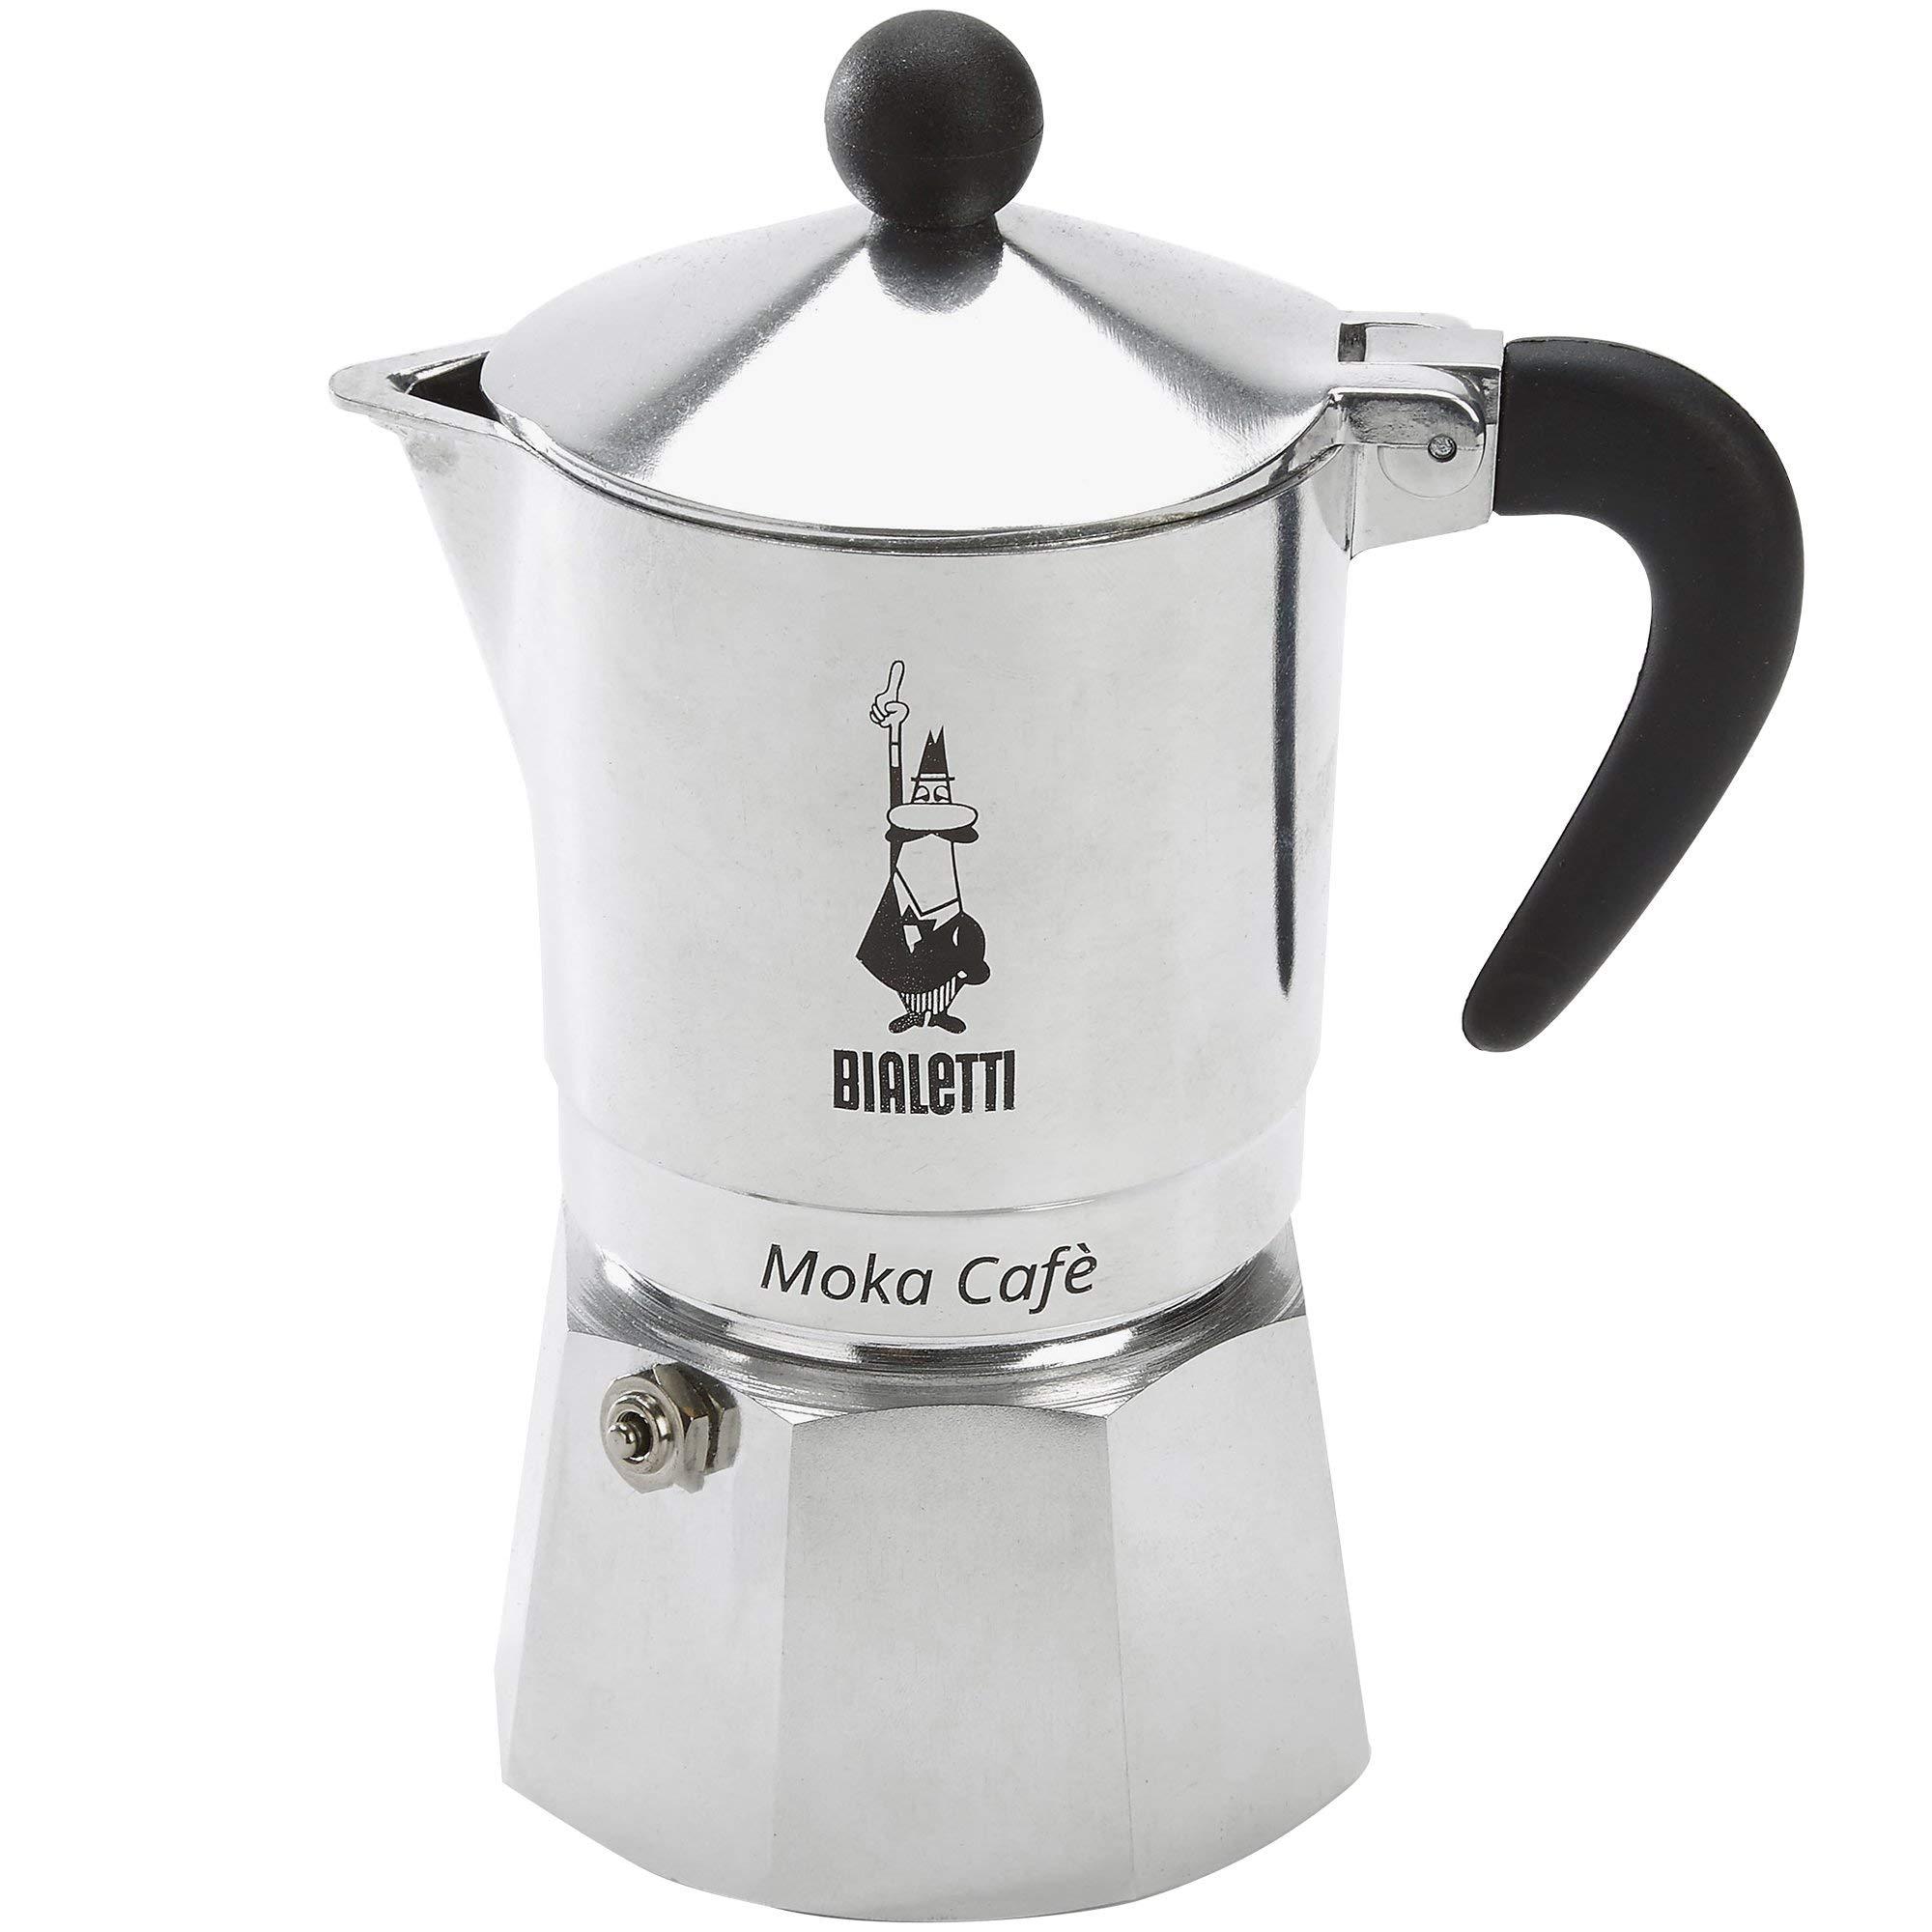 Bialetti Break para Cafetera Espresso 3 Tazas, Aluminio, Negro/Plata, 13 x 9 x 17 cm: Amazon.es: Hogar